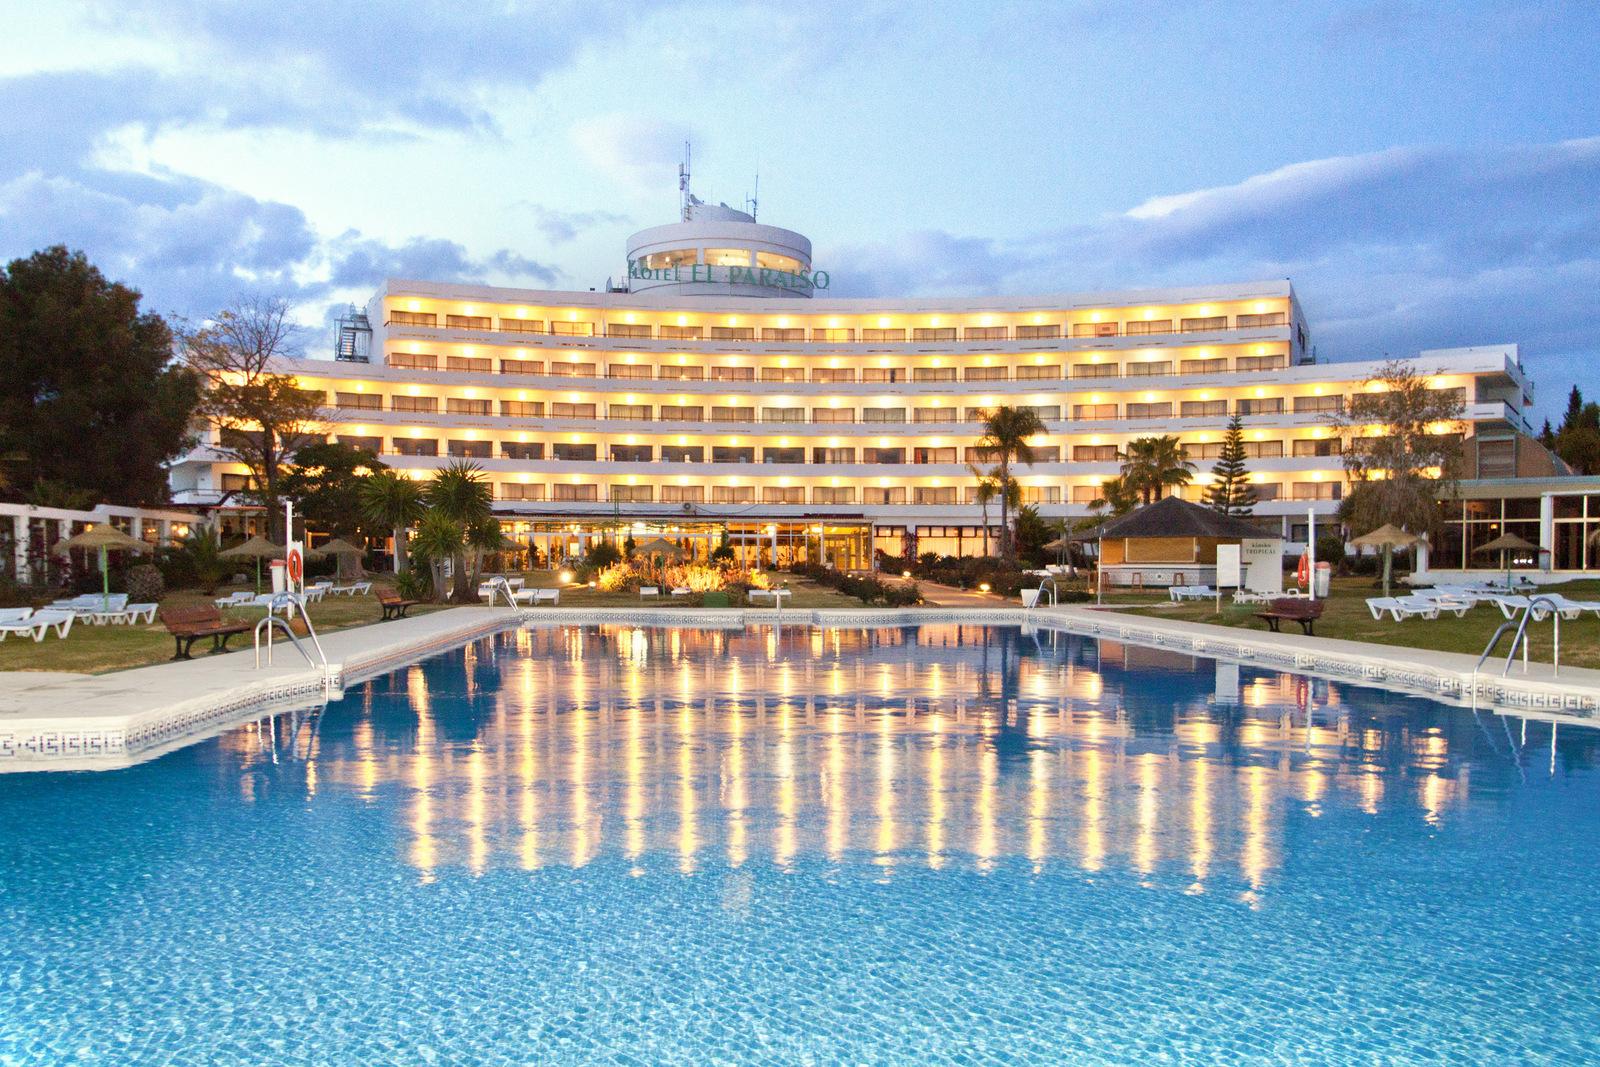 Trh Paraiso Hotel Photos Amp Video Official Website